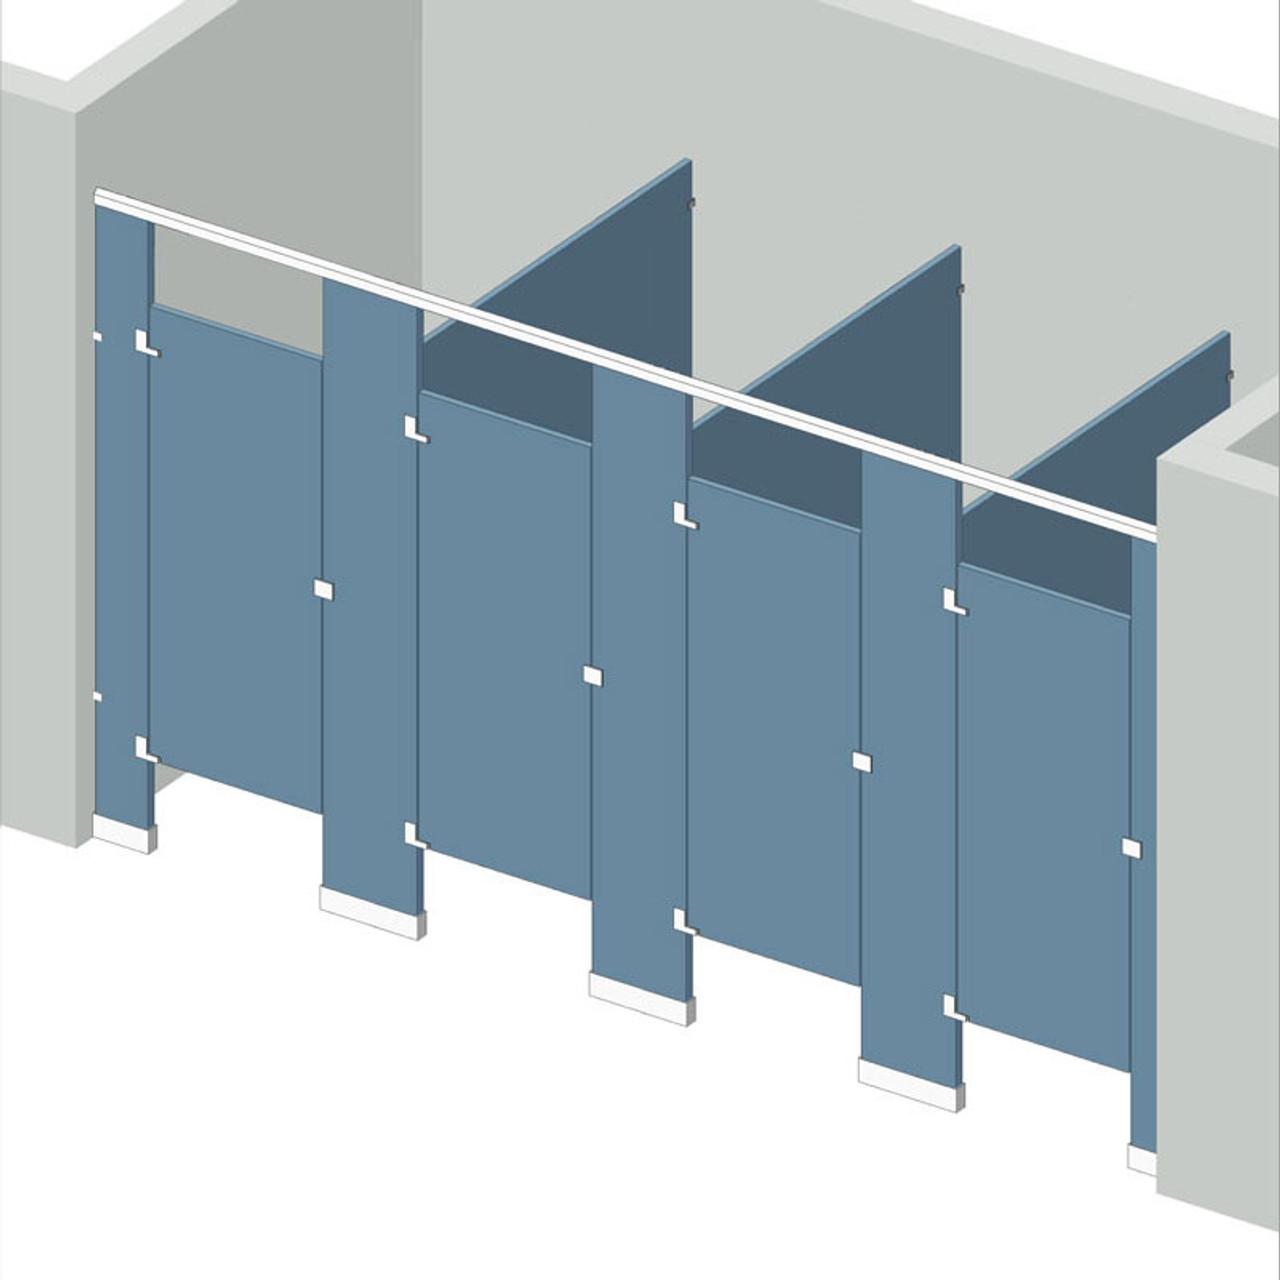 Bathroom Partitions 4 Stalls Between Walls Left Hand